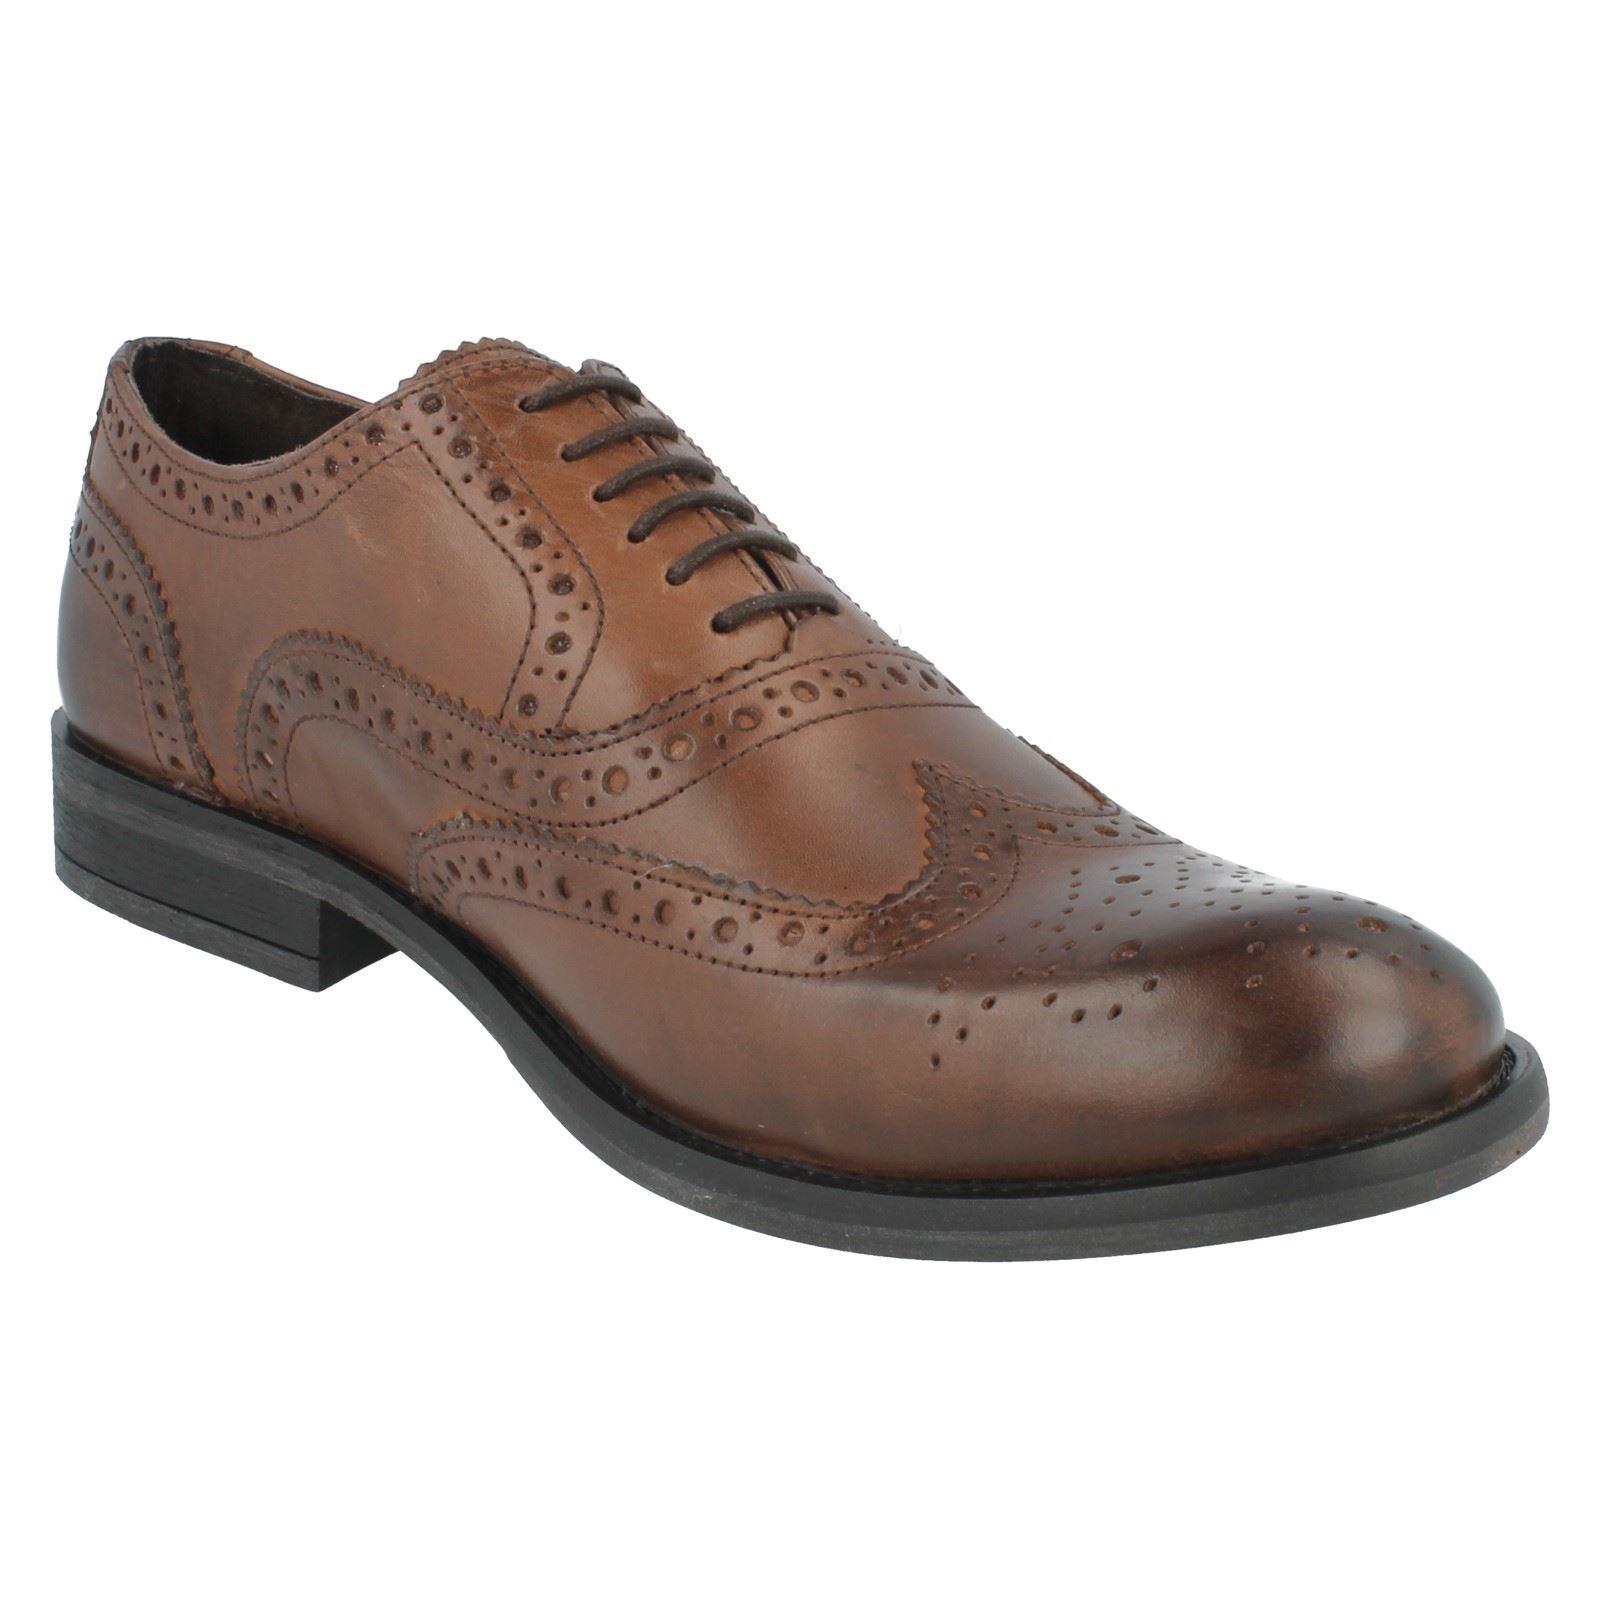 Uomo Base London Walnut Formal Shoes Style - Walnut London MTO 2bddeb